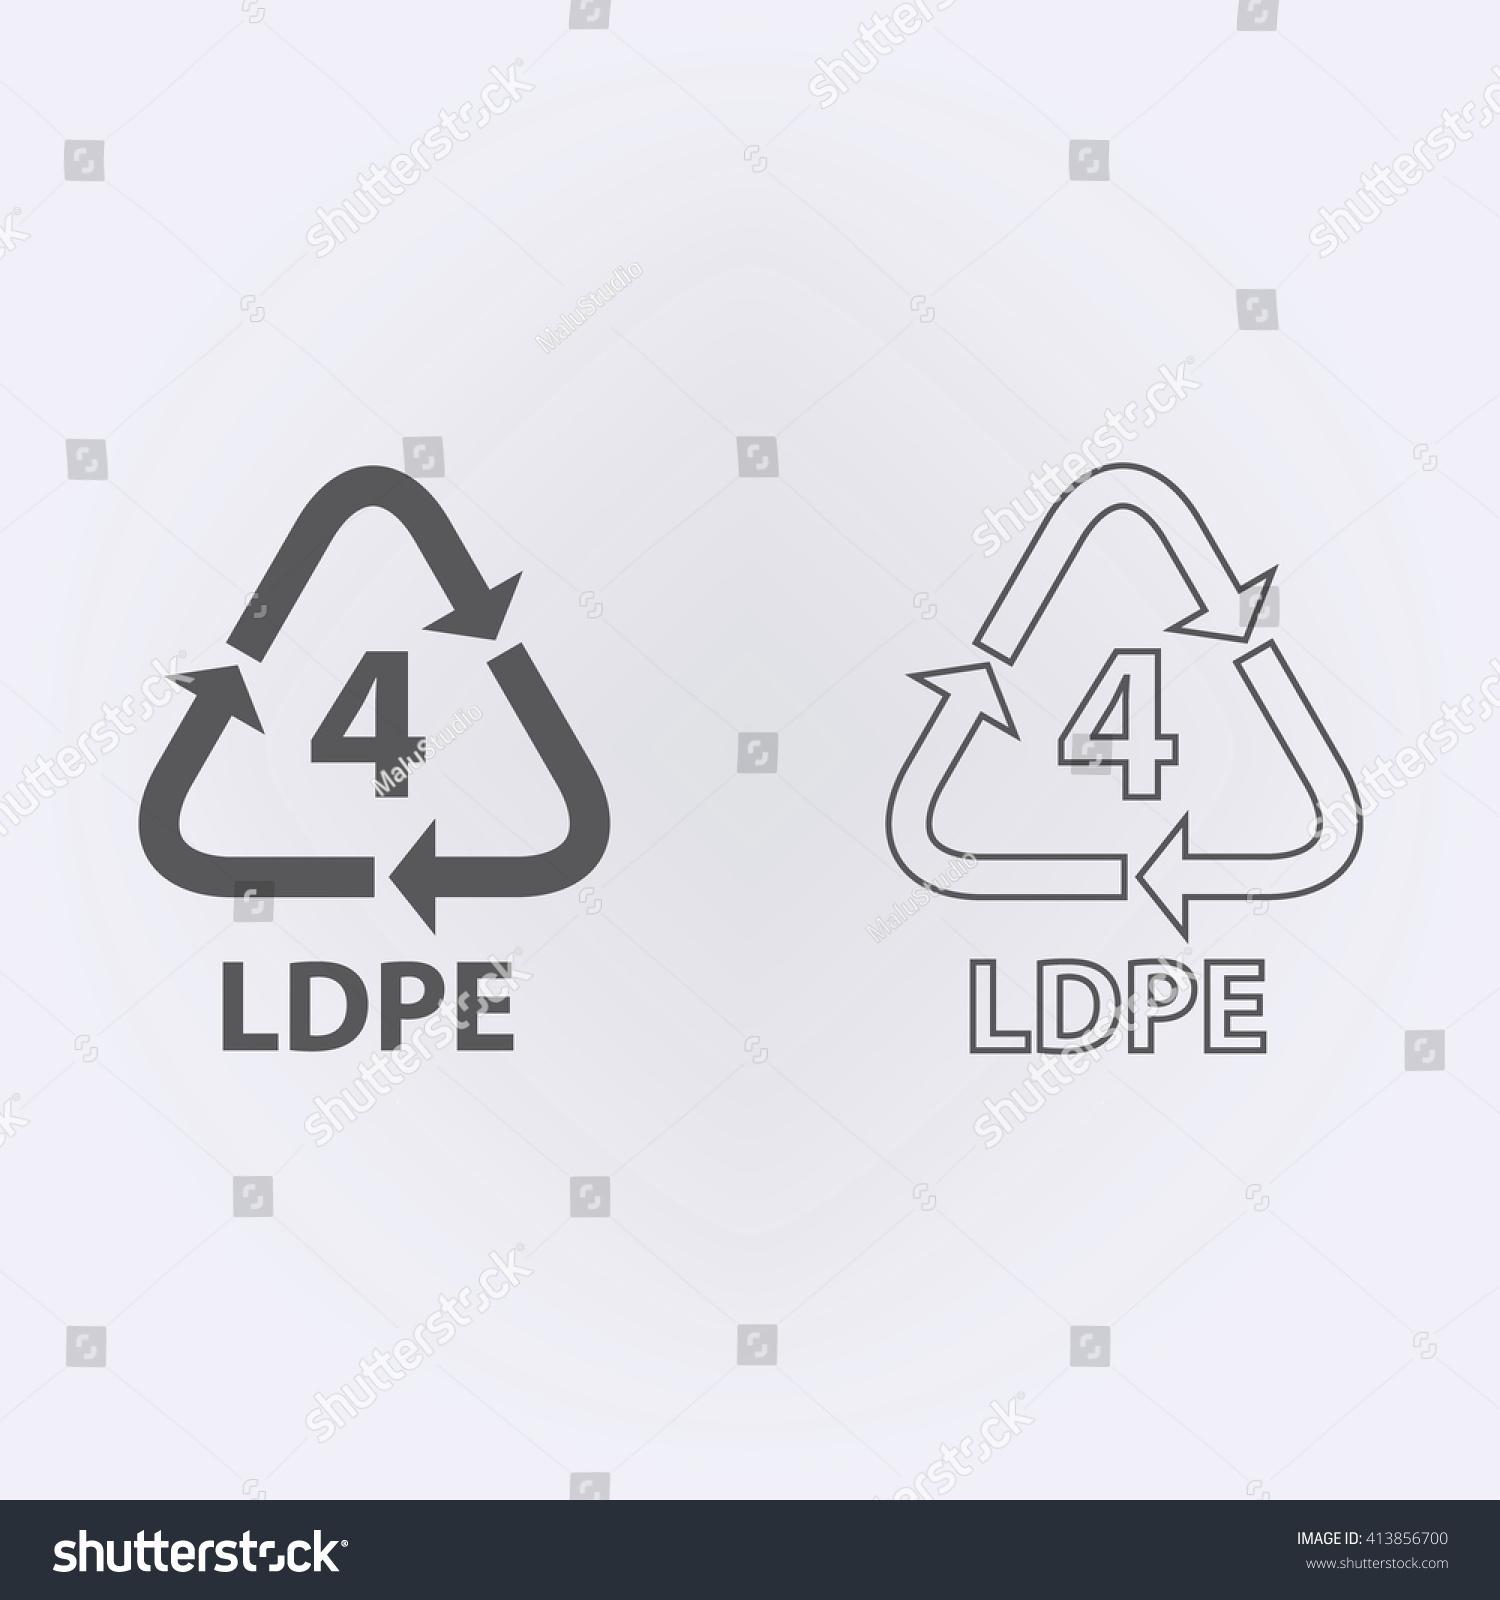 Plastic recycling symbol ldpe 4 vector stock vector 413856700 plastic recycling symbol ldpe 4 vector illustration biocorpaavc Choice Image